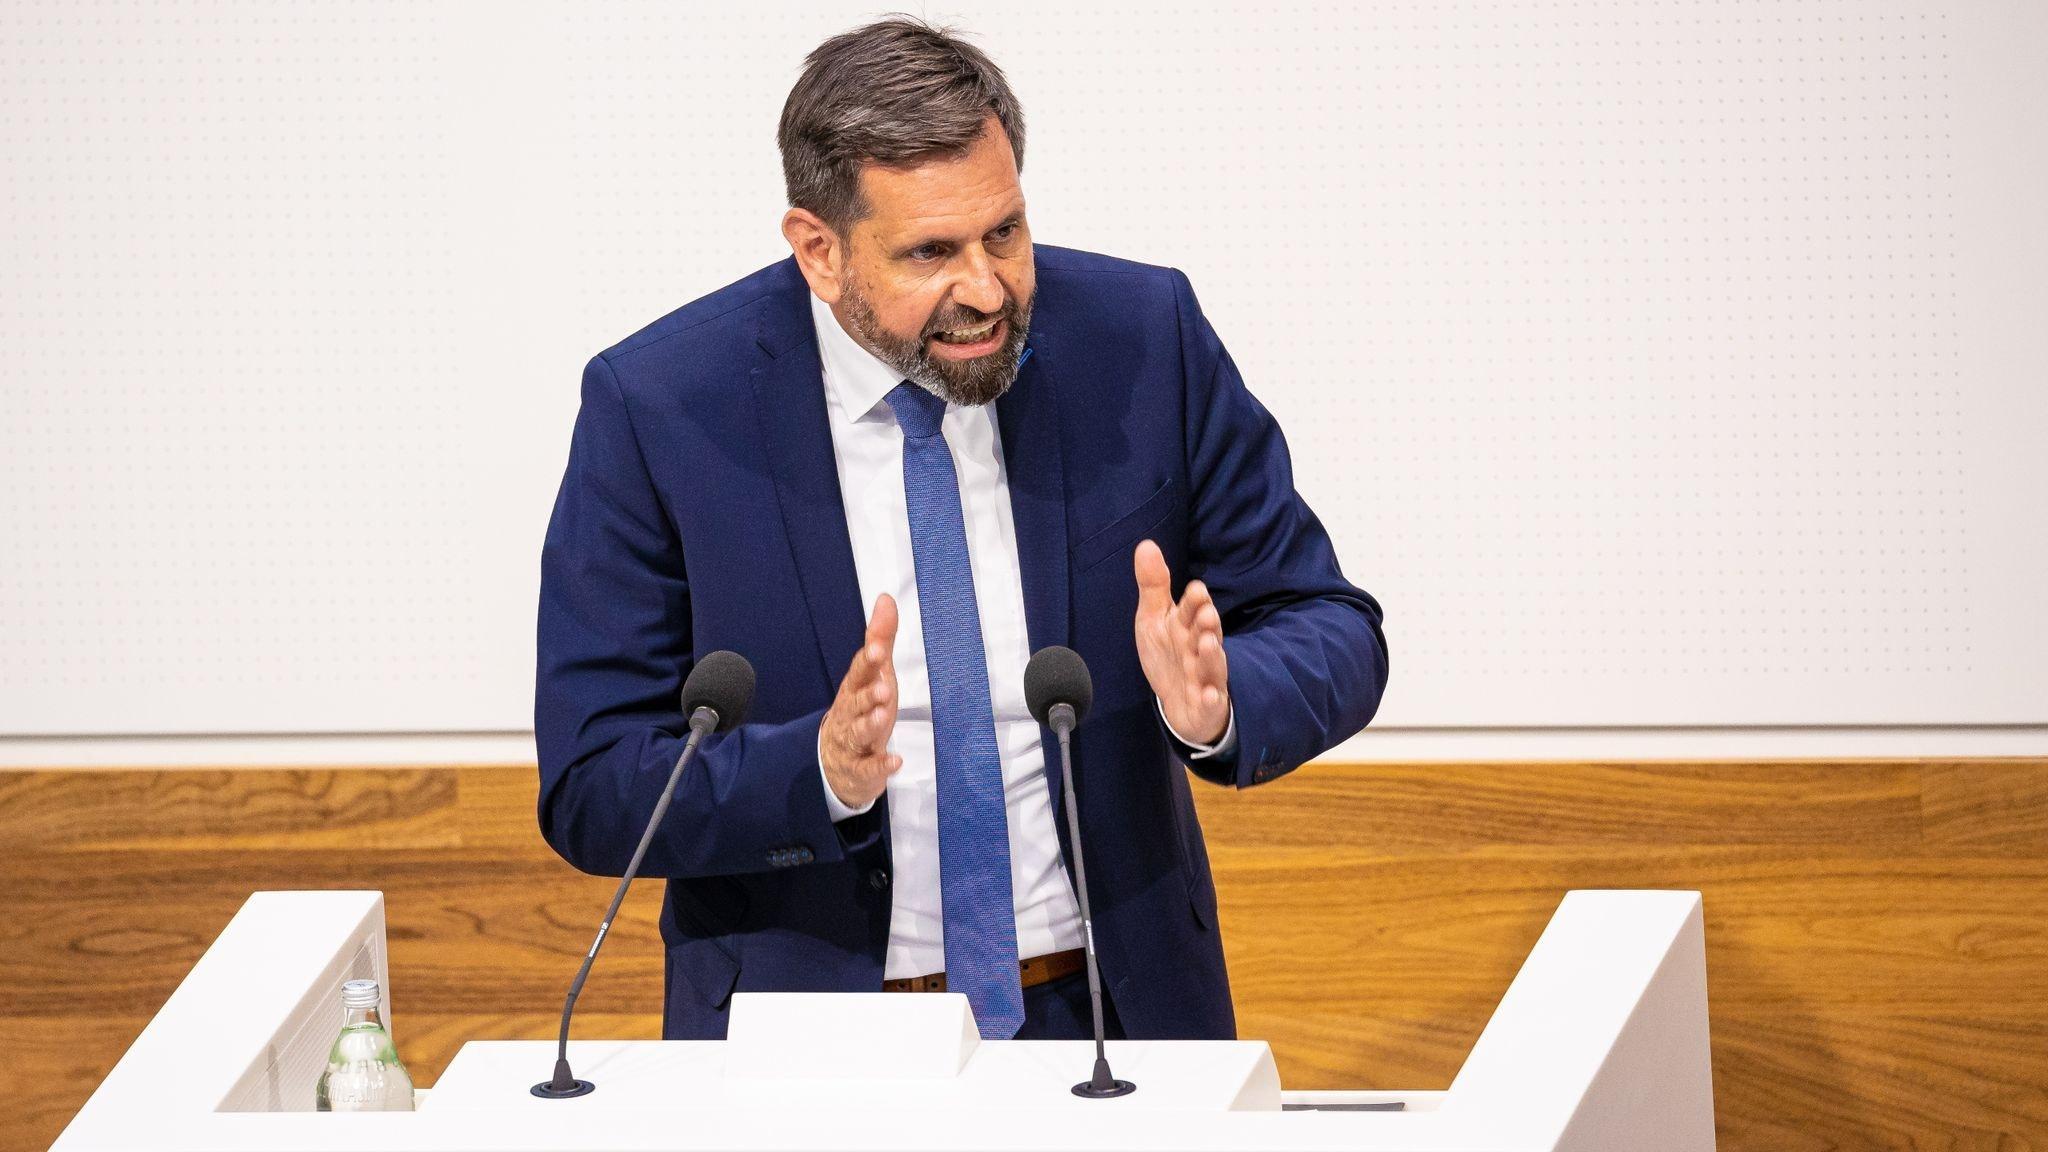 Niedersachsens Umweltminister Olaf Lies (SPD). Foto: dpa/Frankenberg